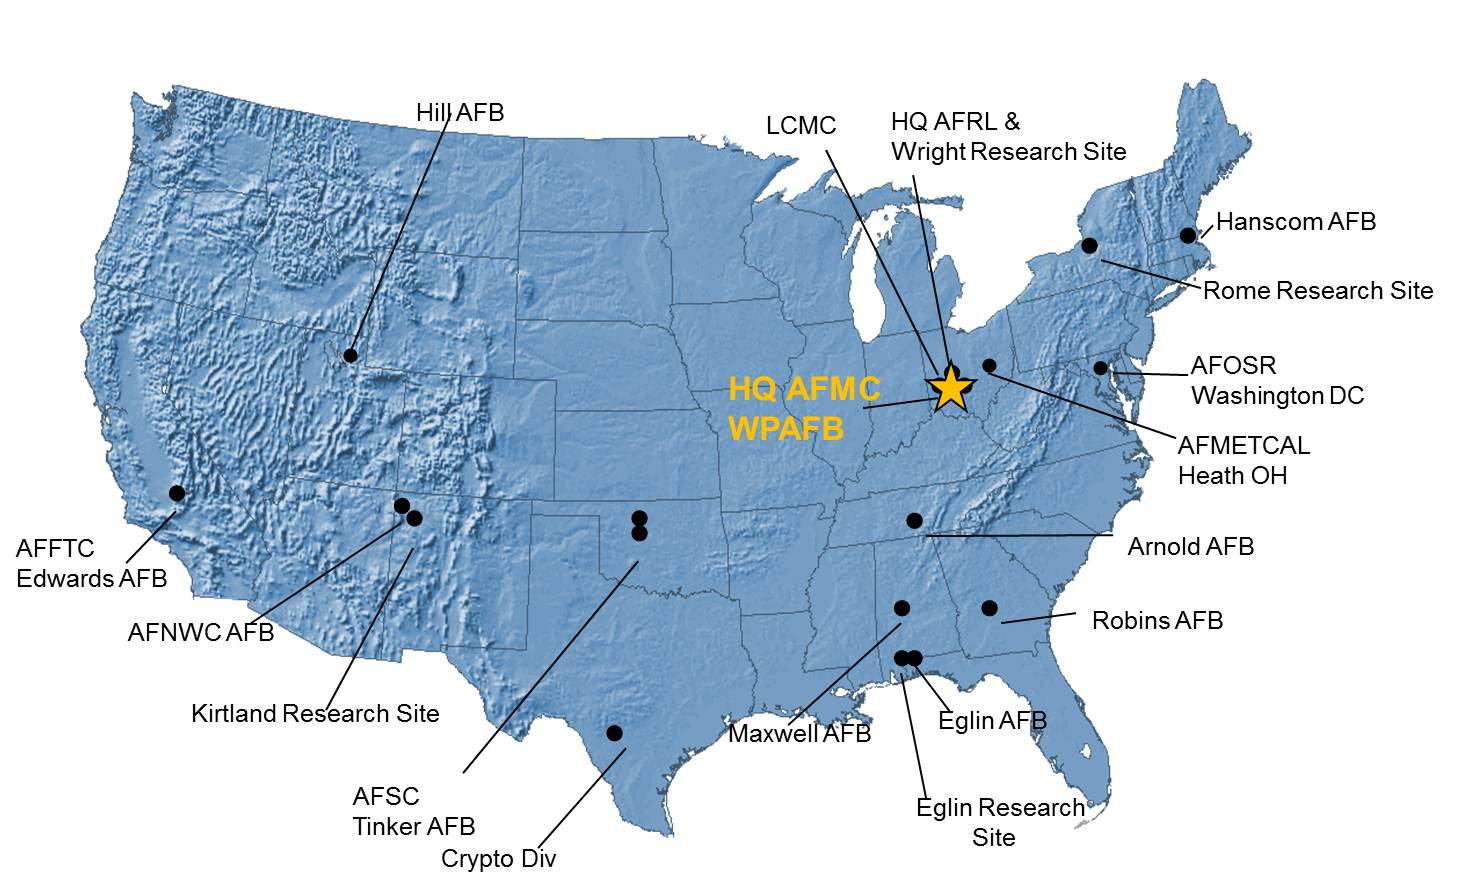 AFMC Small Business Office - Washington dc hubzone map